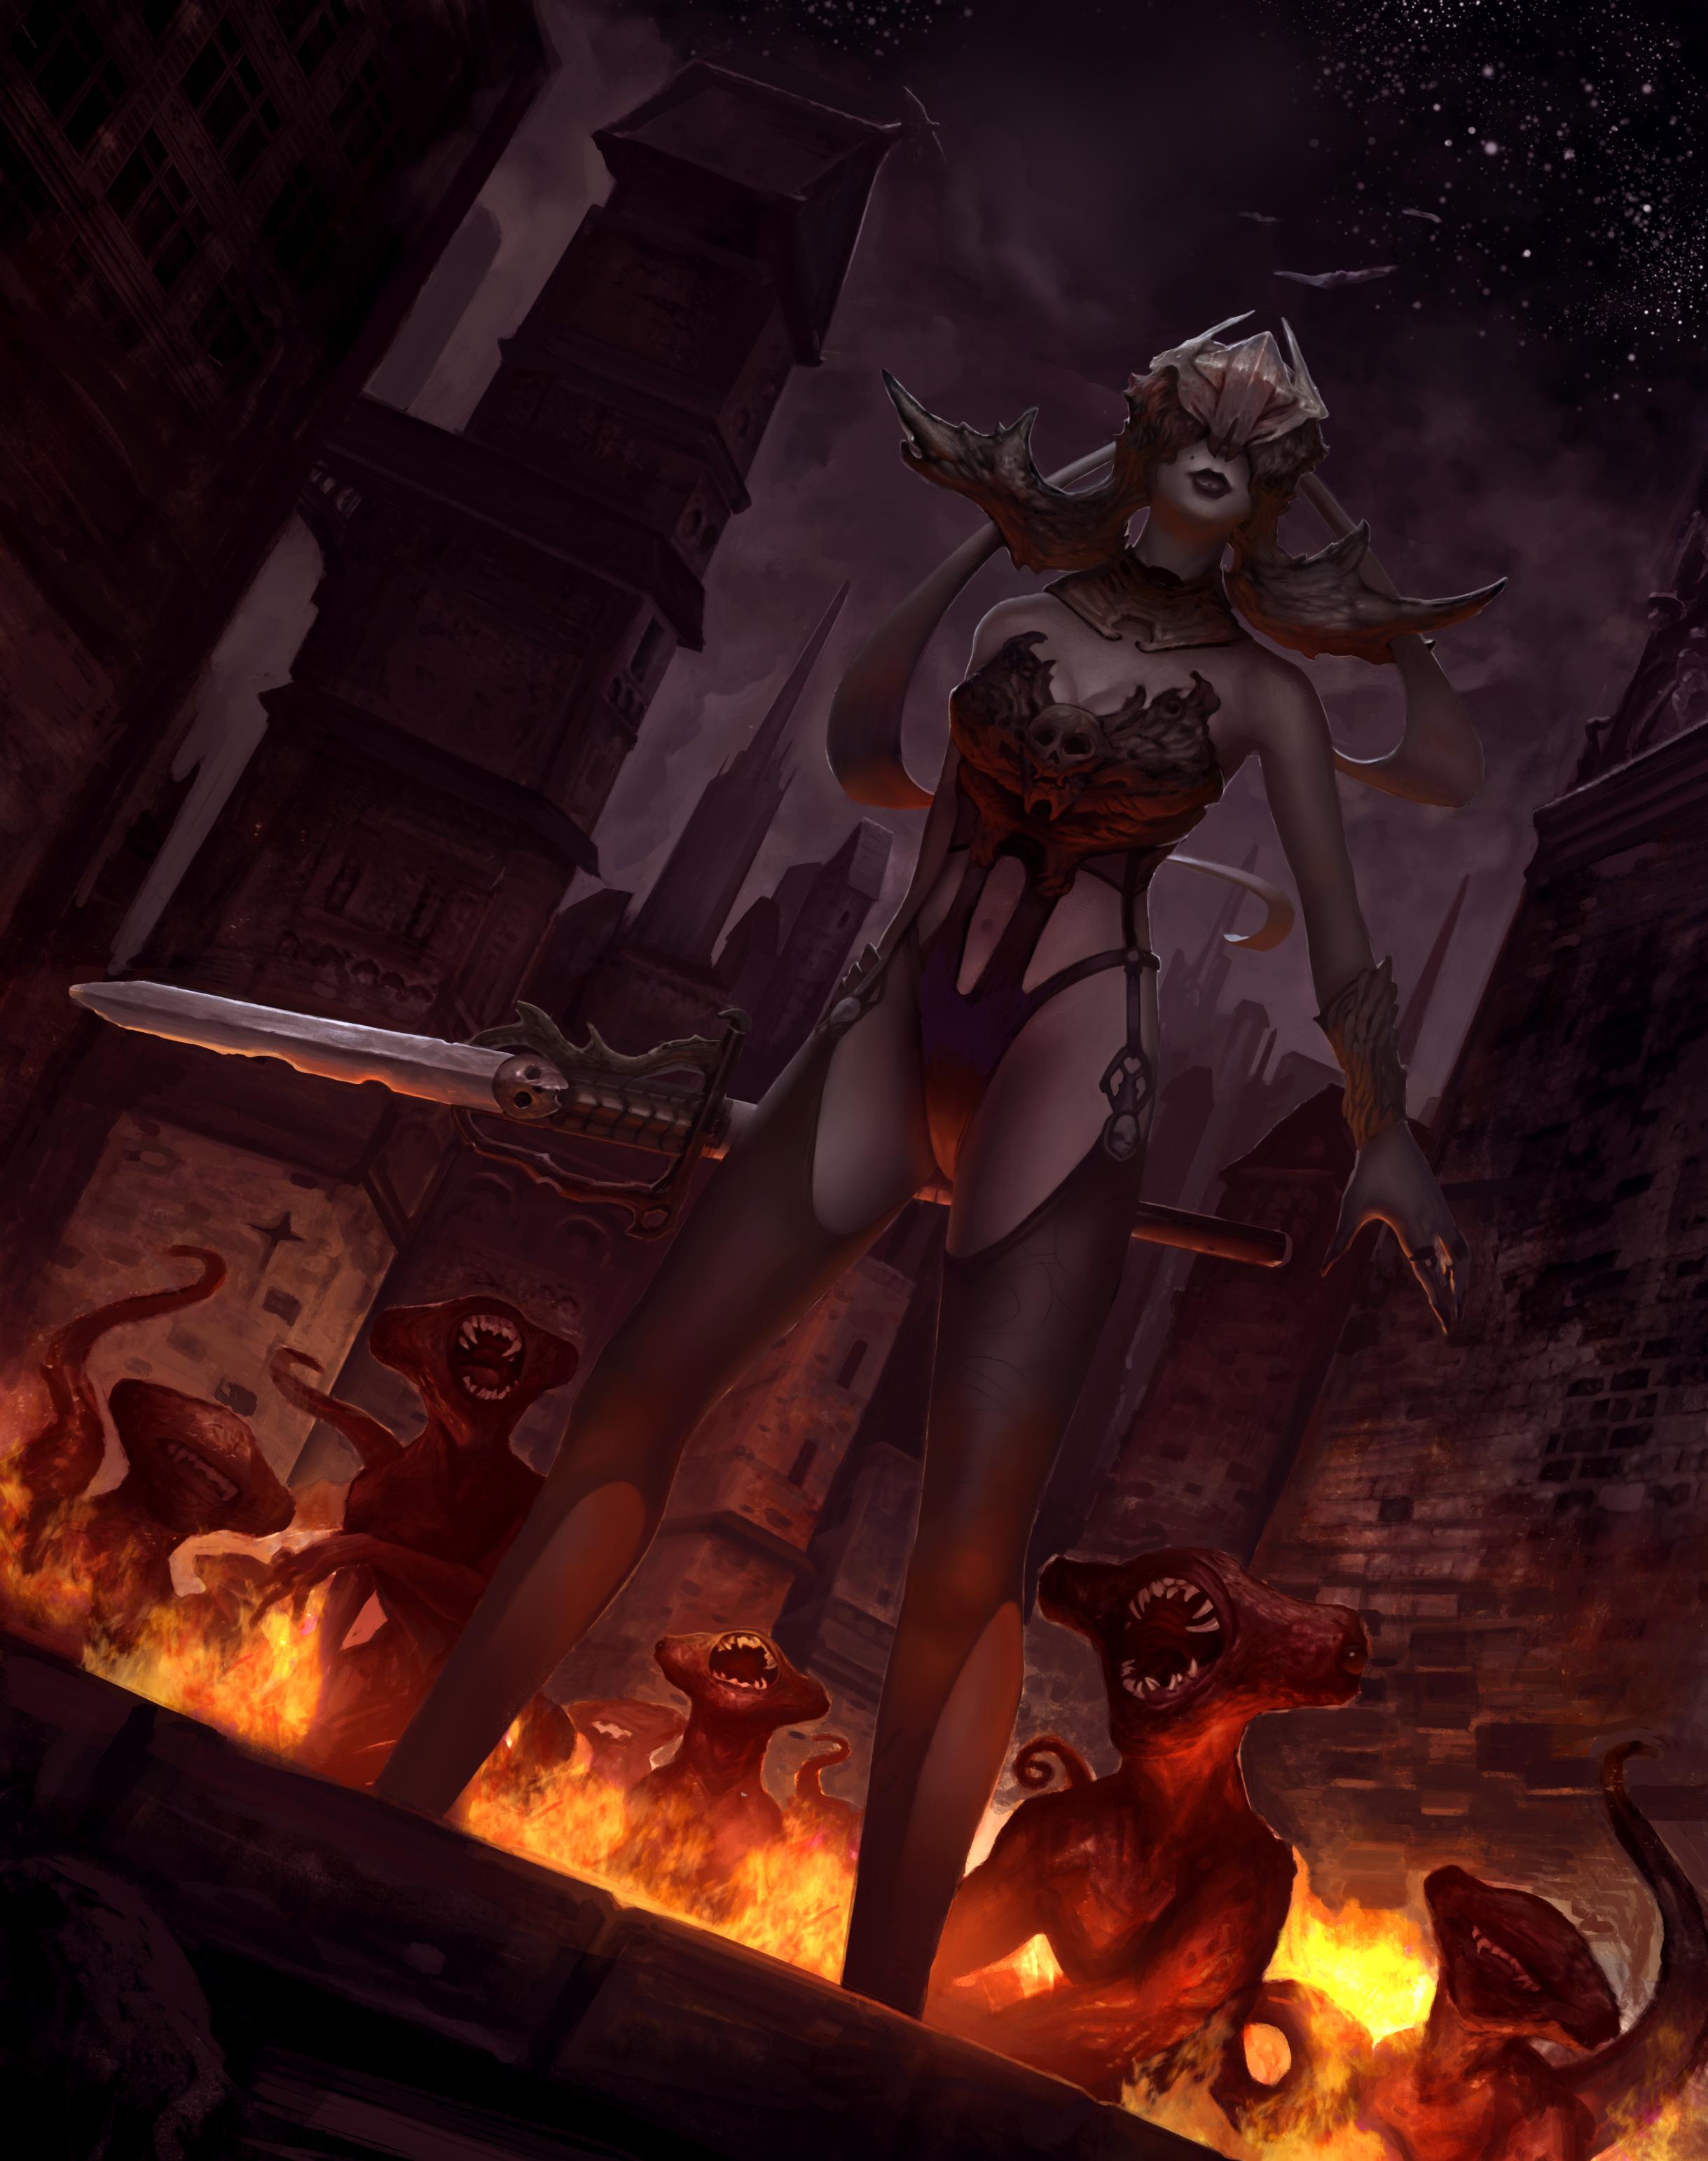 Card-illustration-Chynan demon sorceress__v003_color corrected-Recovered.jpg